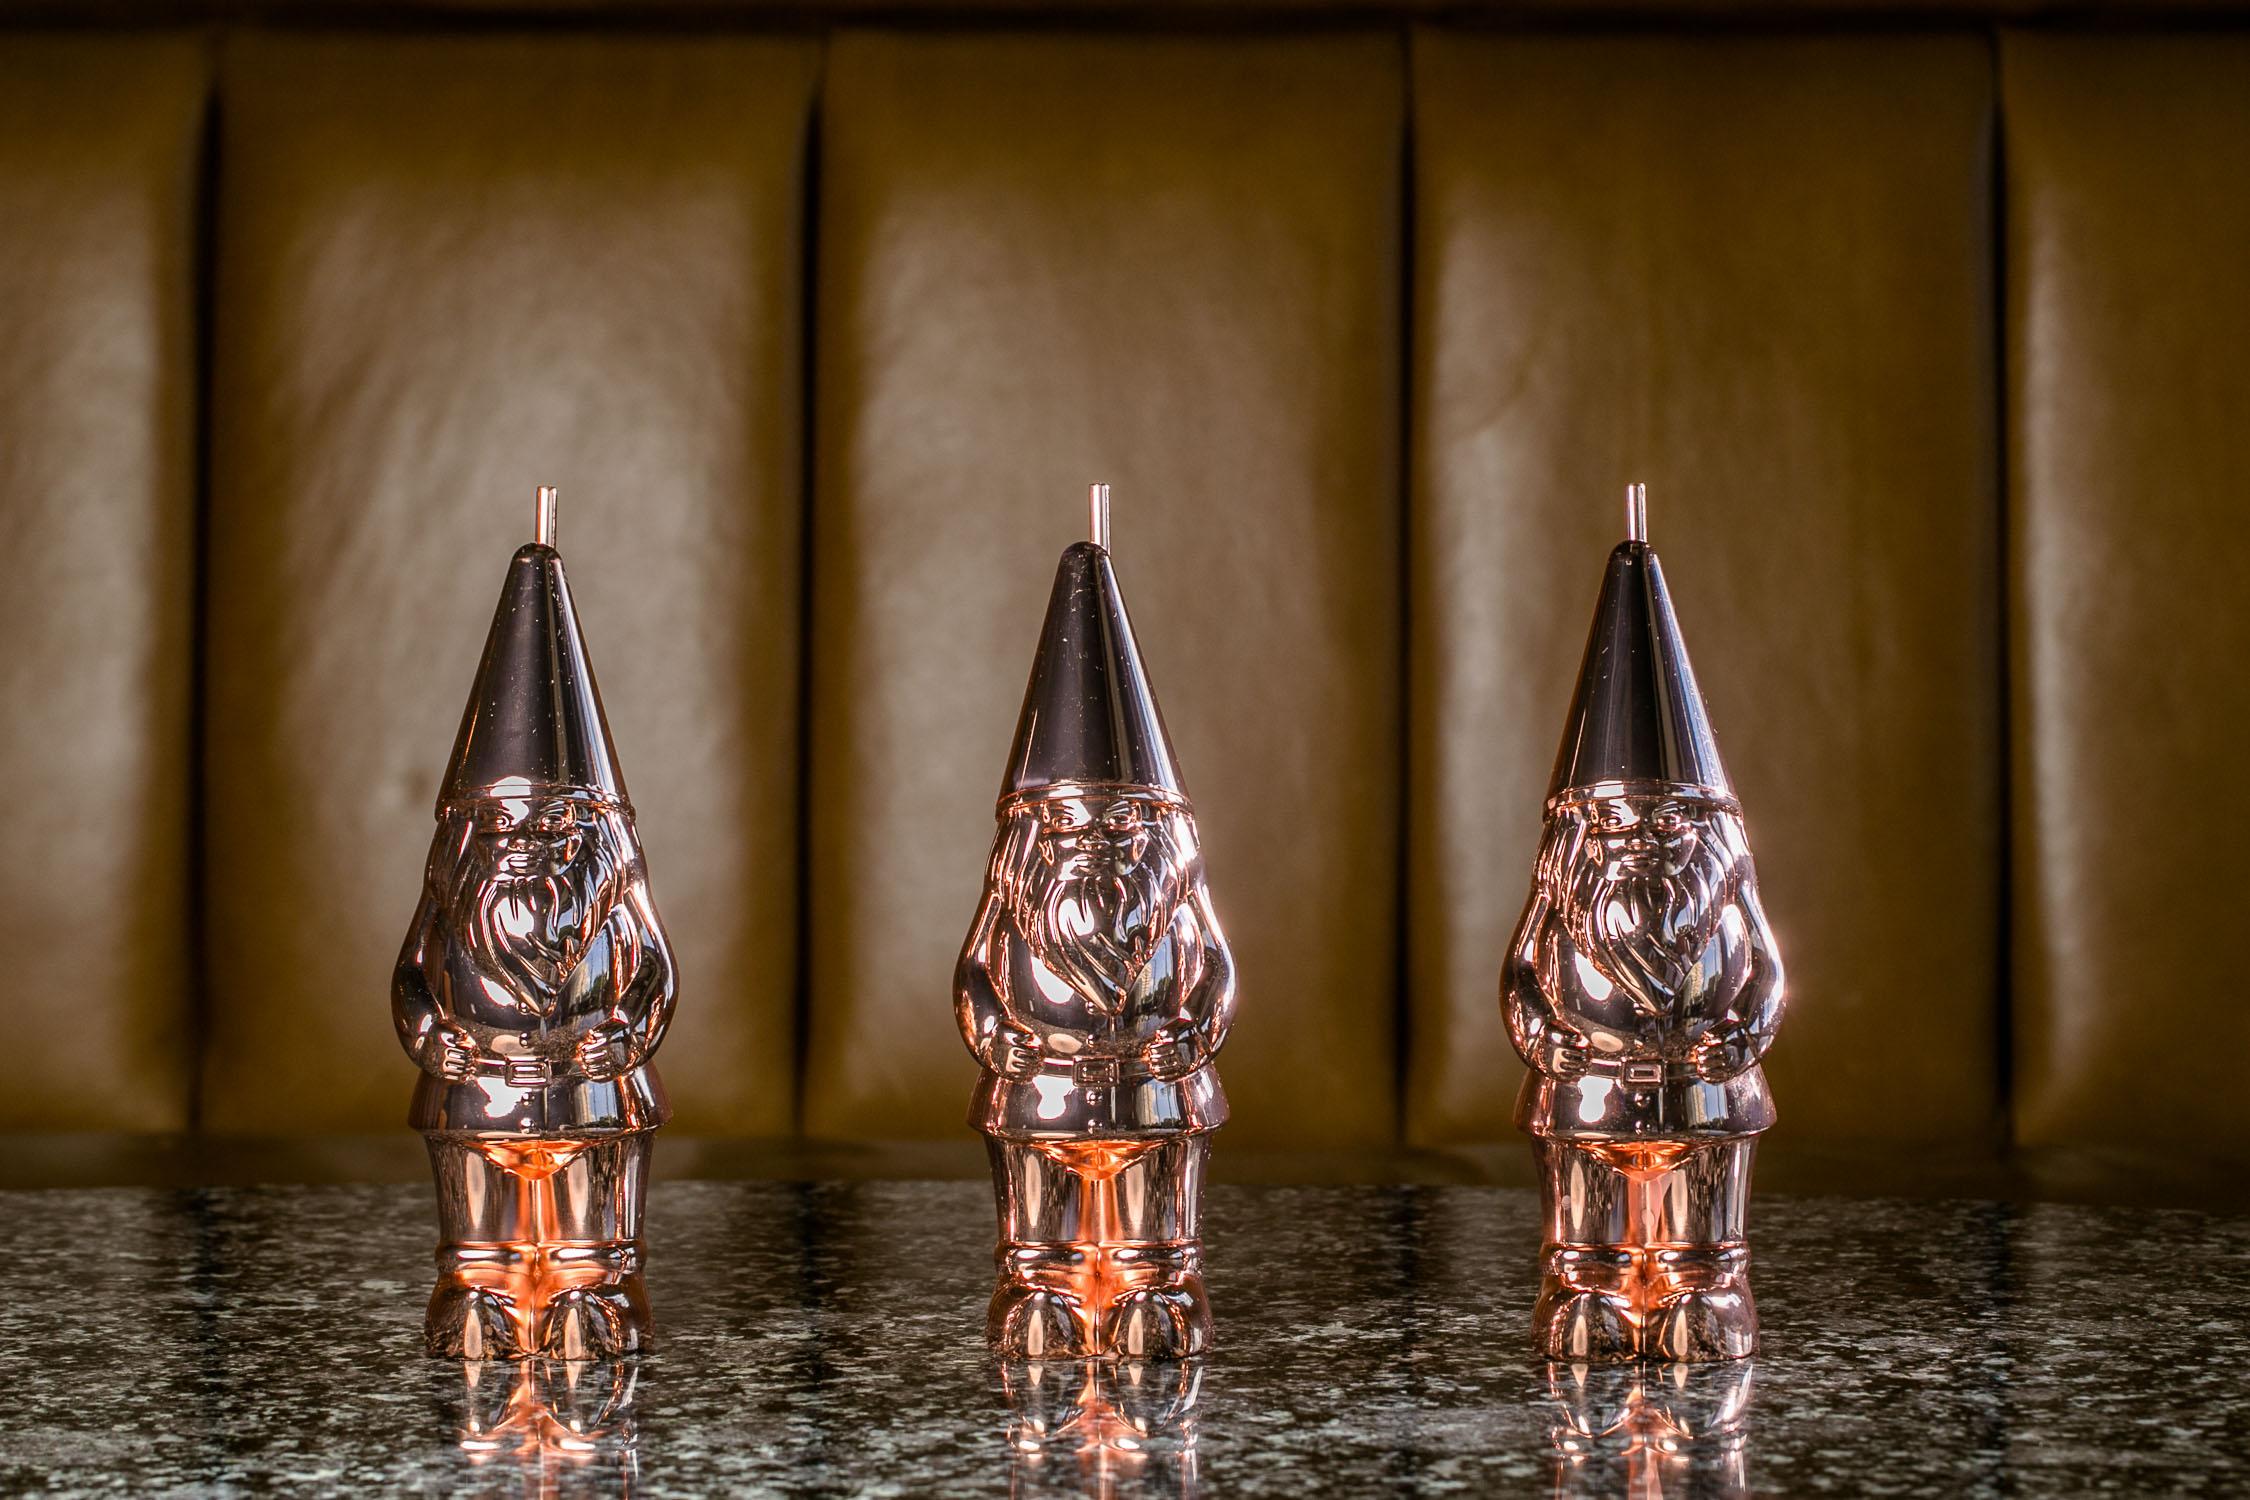 Omni-Hotel-at-The-Battery-Atlanta-Suntrust-Park-Cocktail-Gnomes-Erik-Meadows